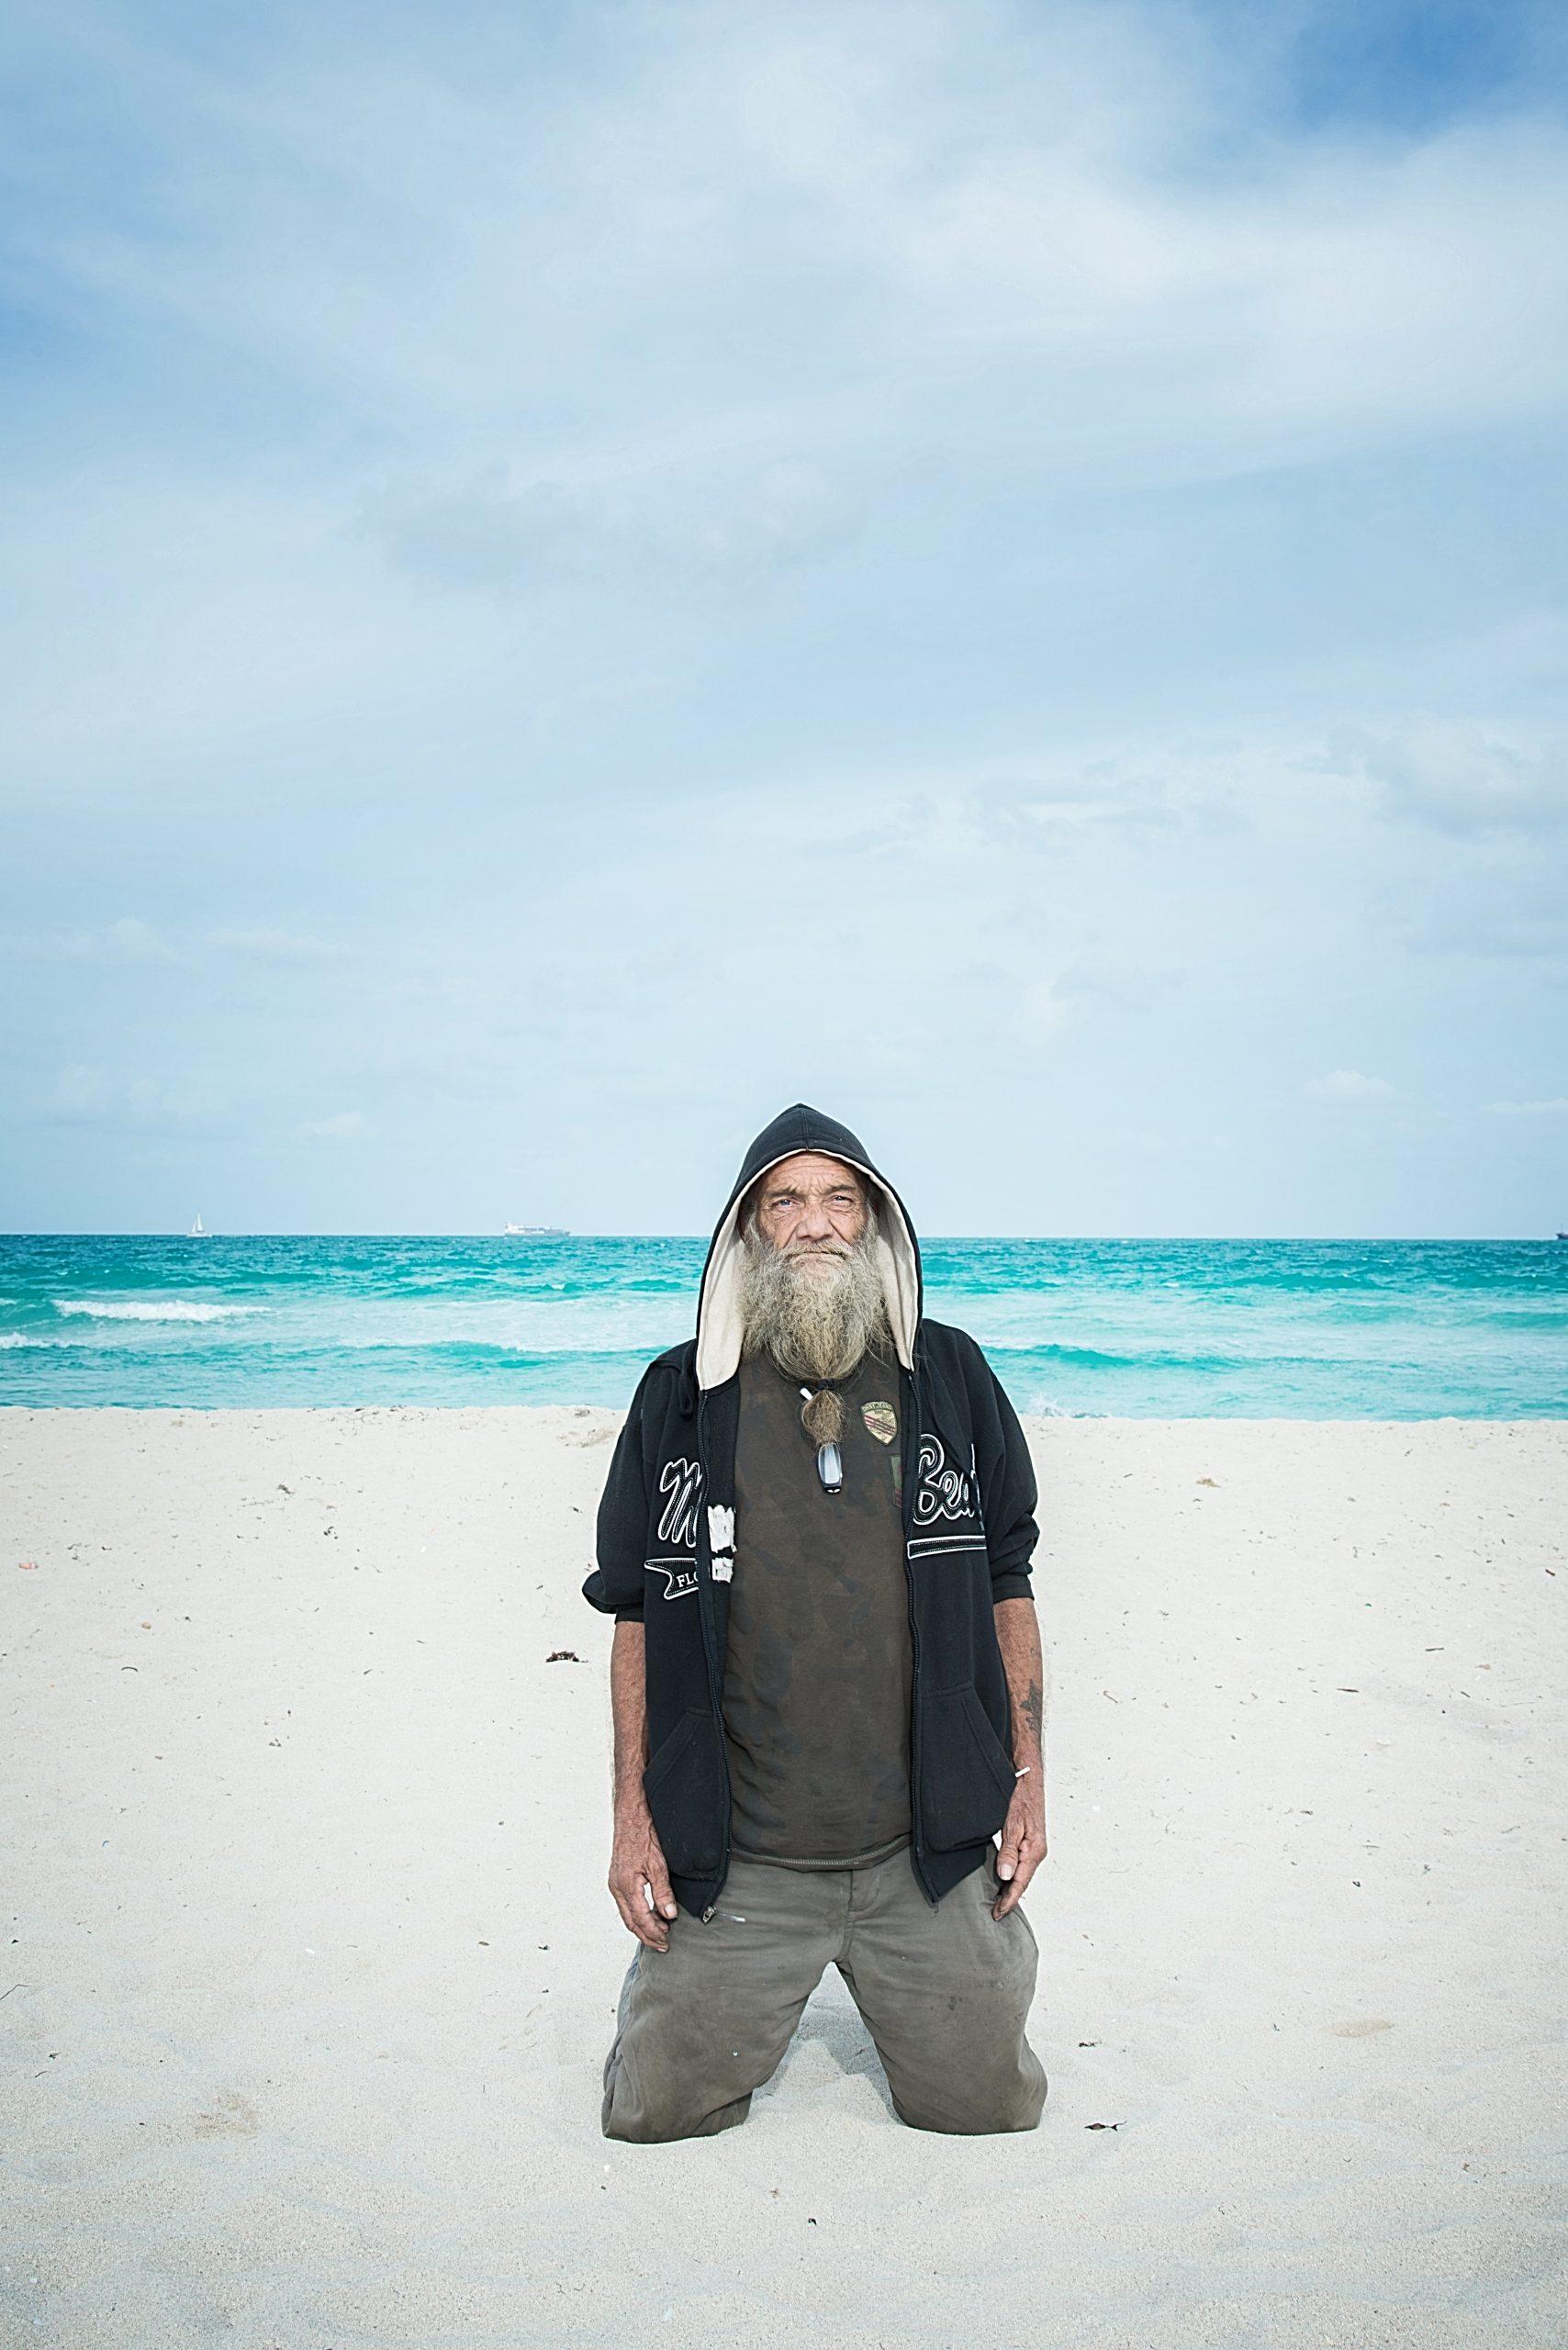 Homeless on the Miami beach